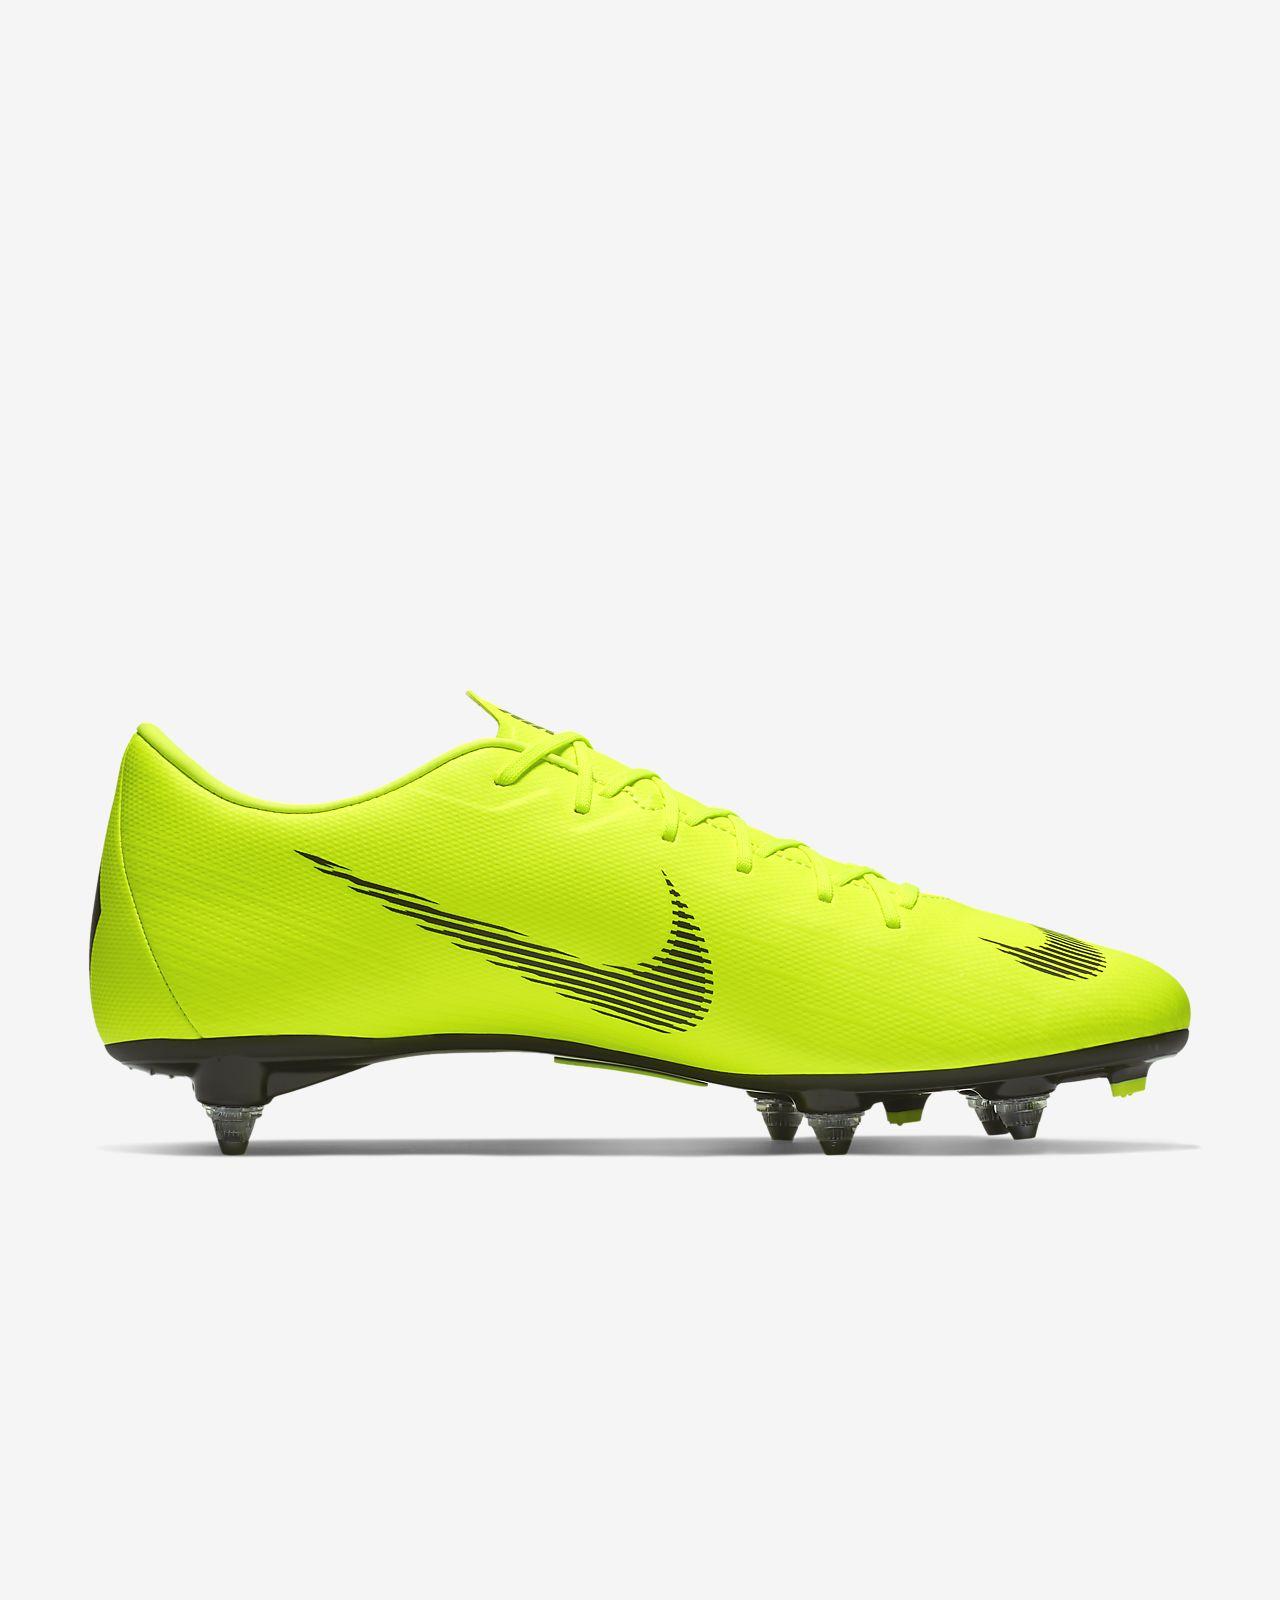 cab5ebb4c55 Nike Mercurial Vapor XII Academy SG-PRO Soft-Ground Football Boot ...